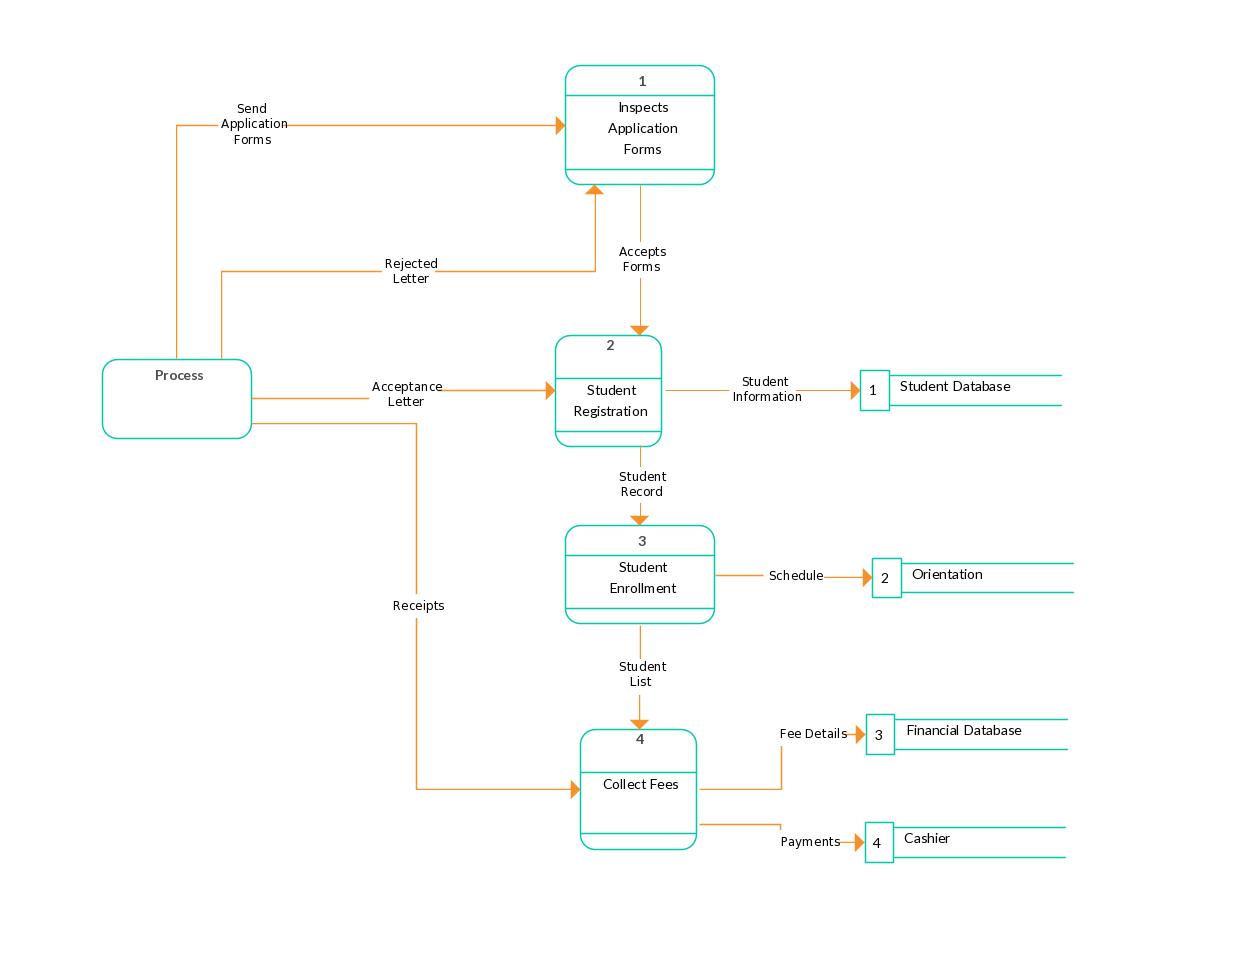 Data Flow Diagram Template Of University Admission | Data